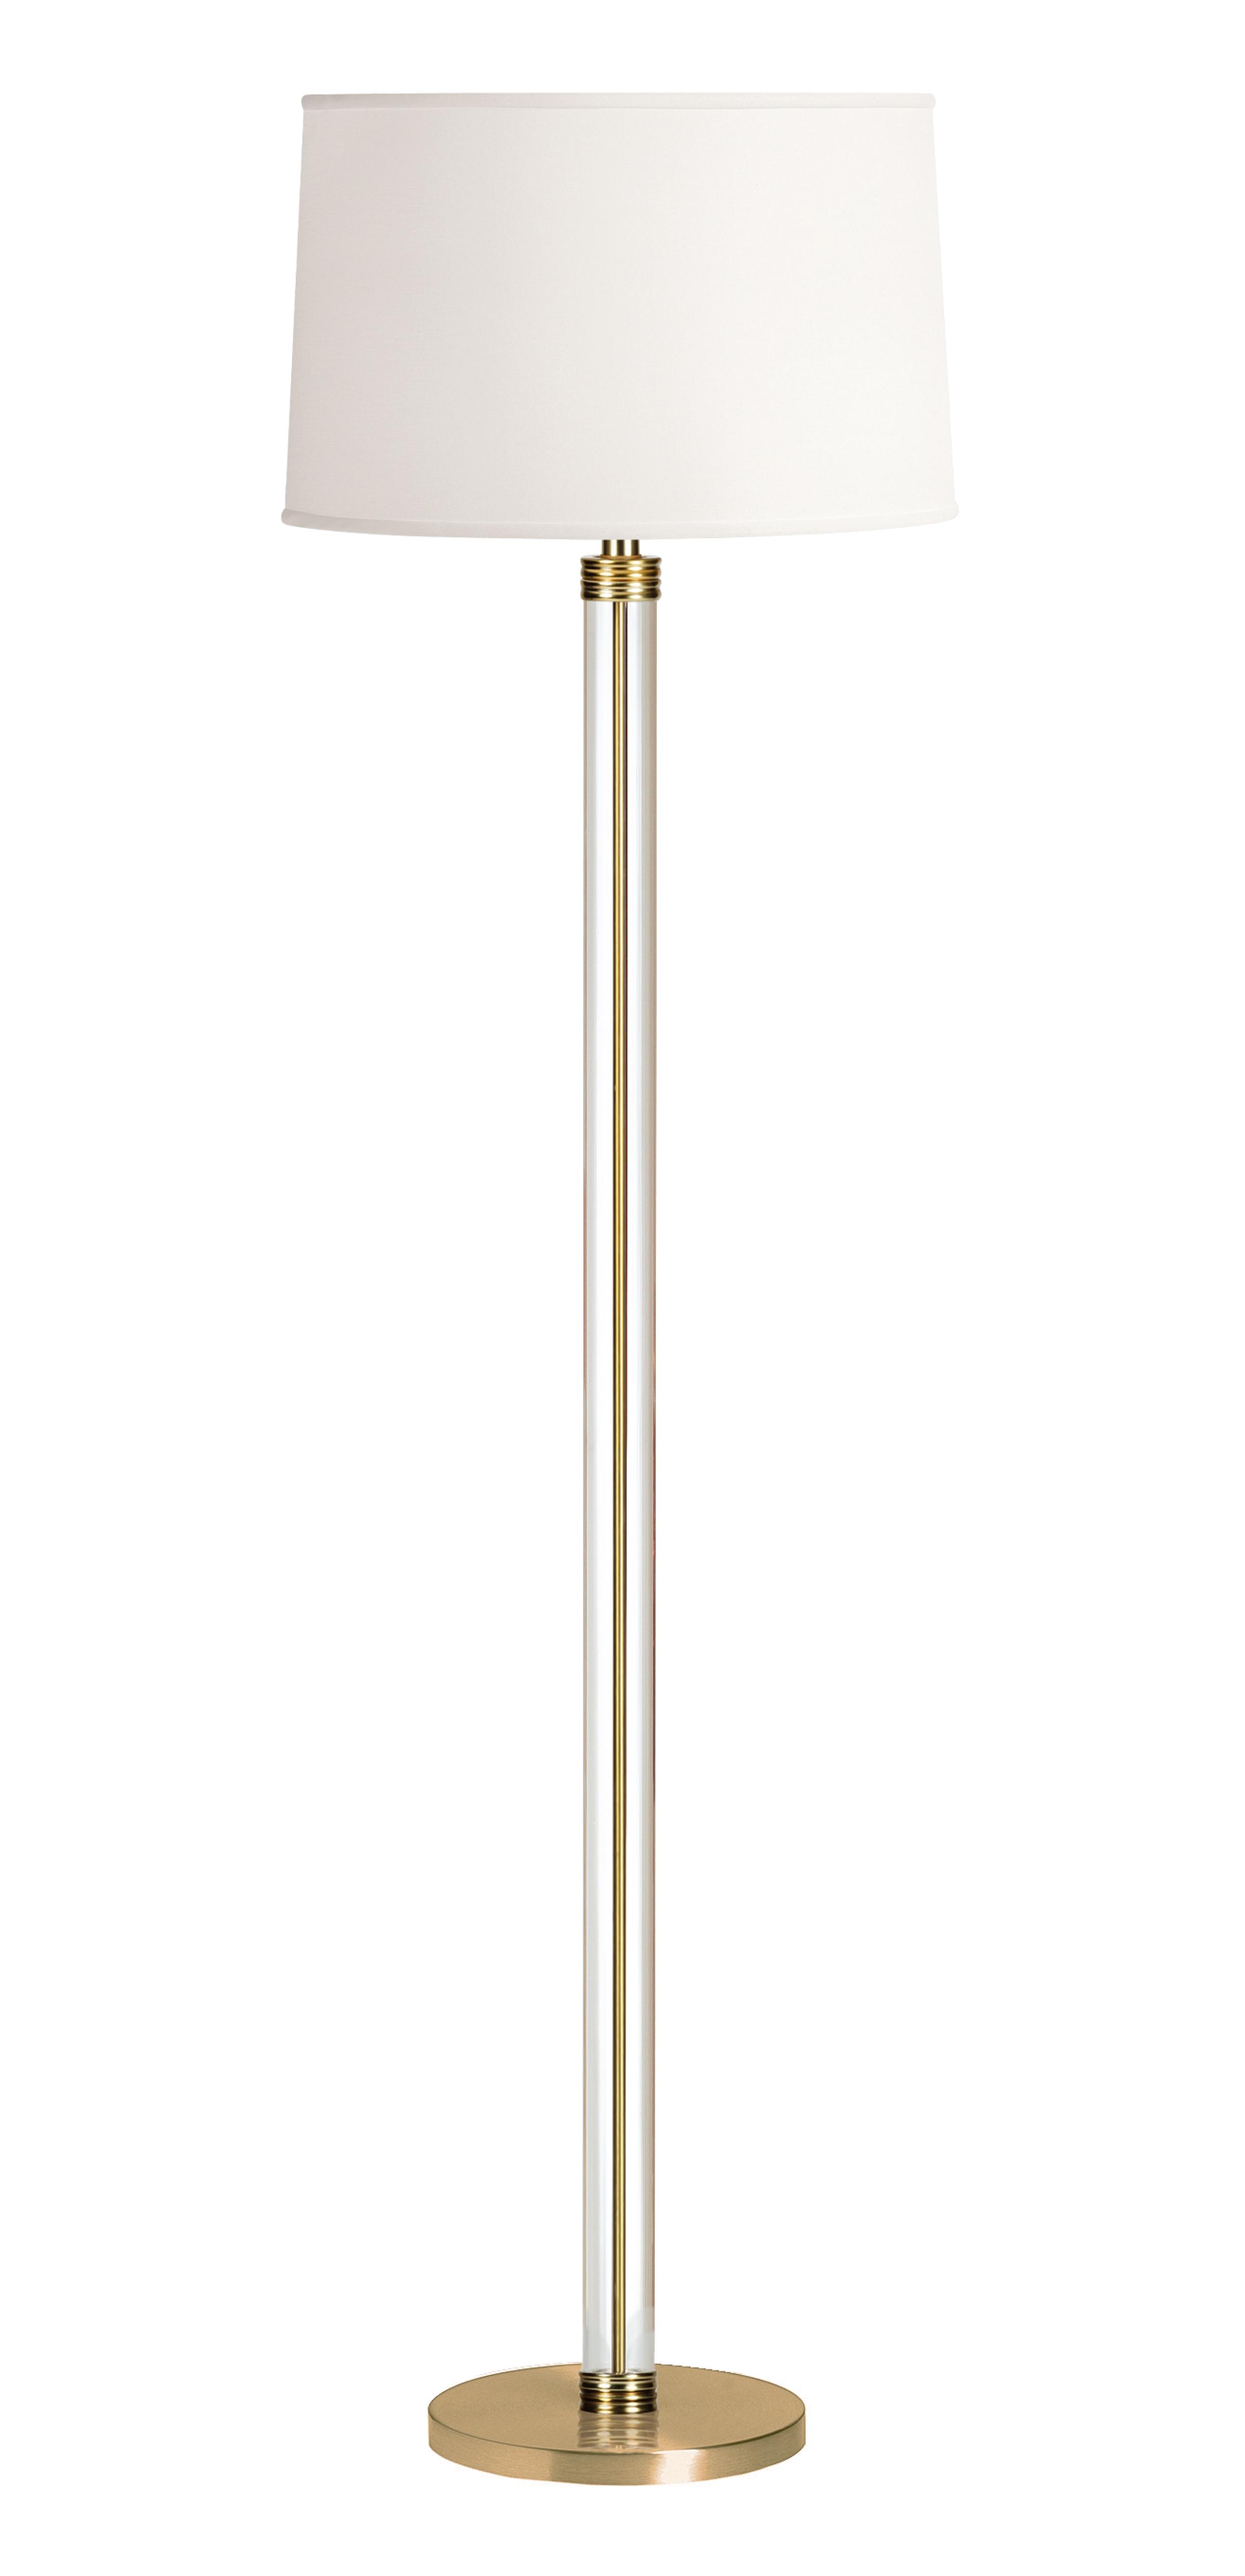 2684 Coronet Lighting